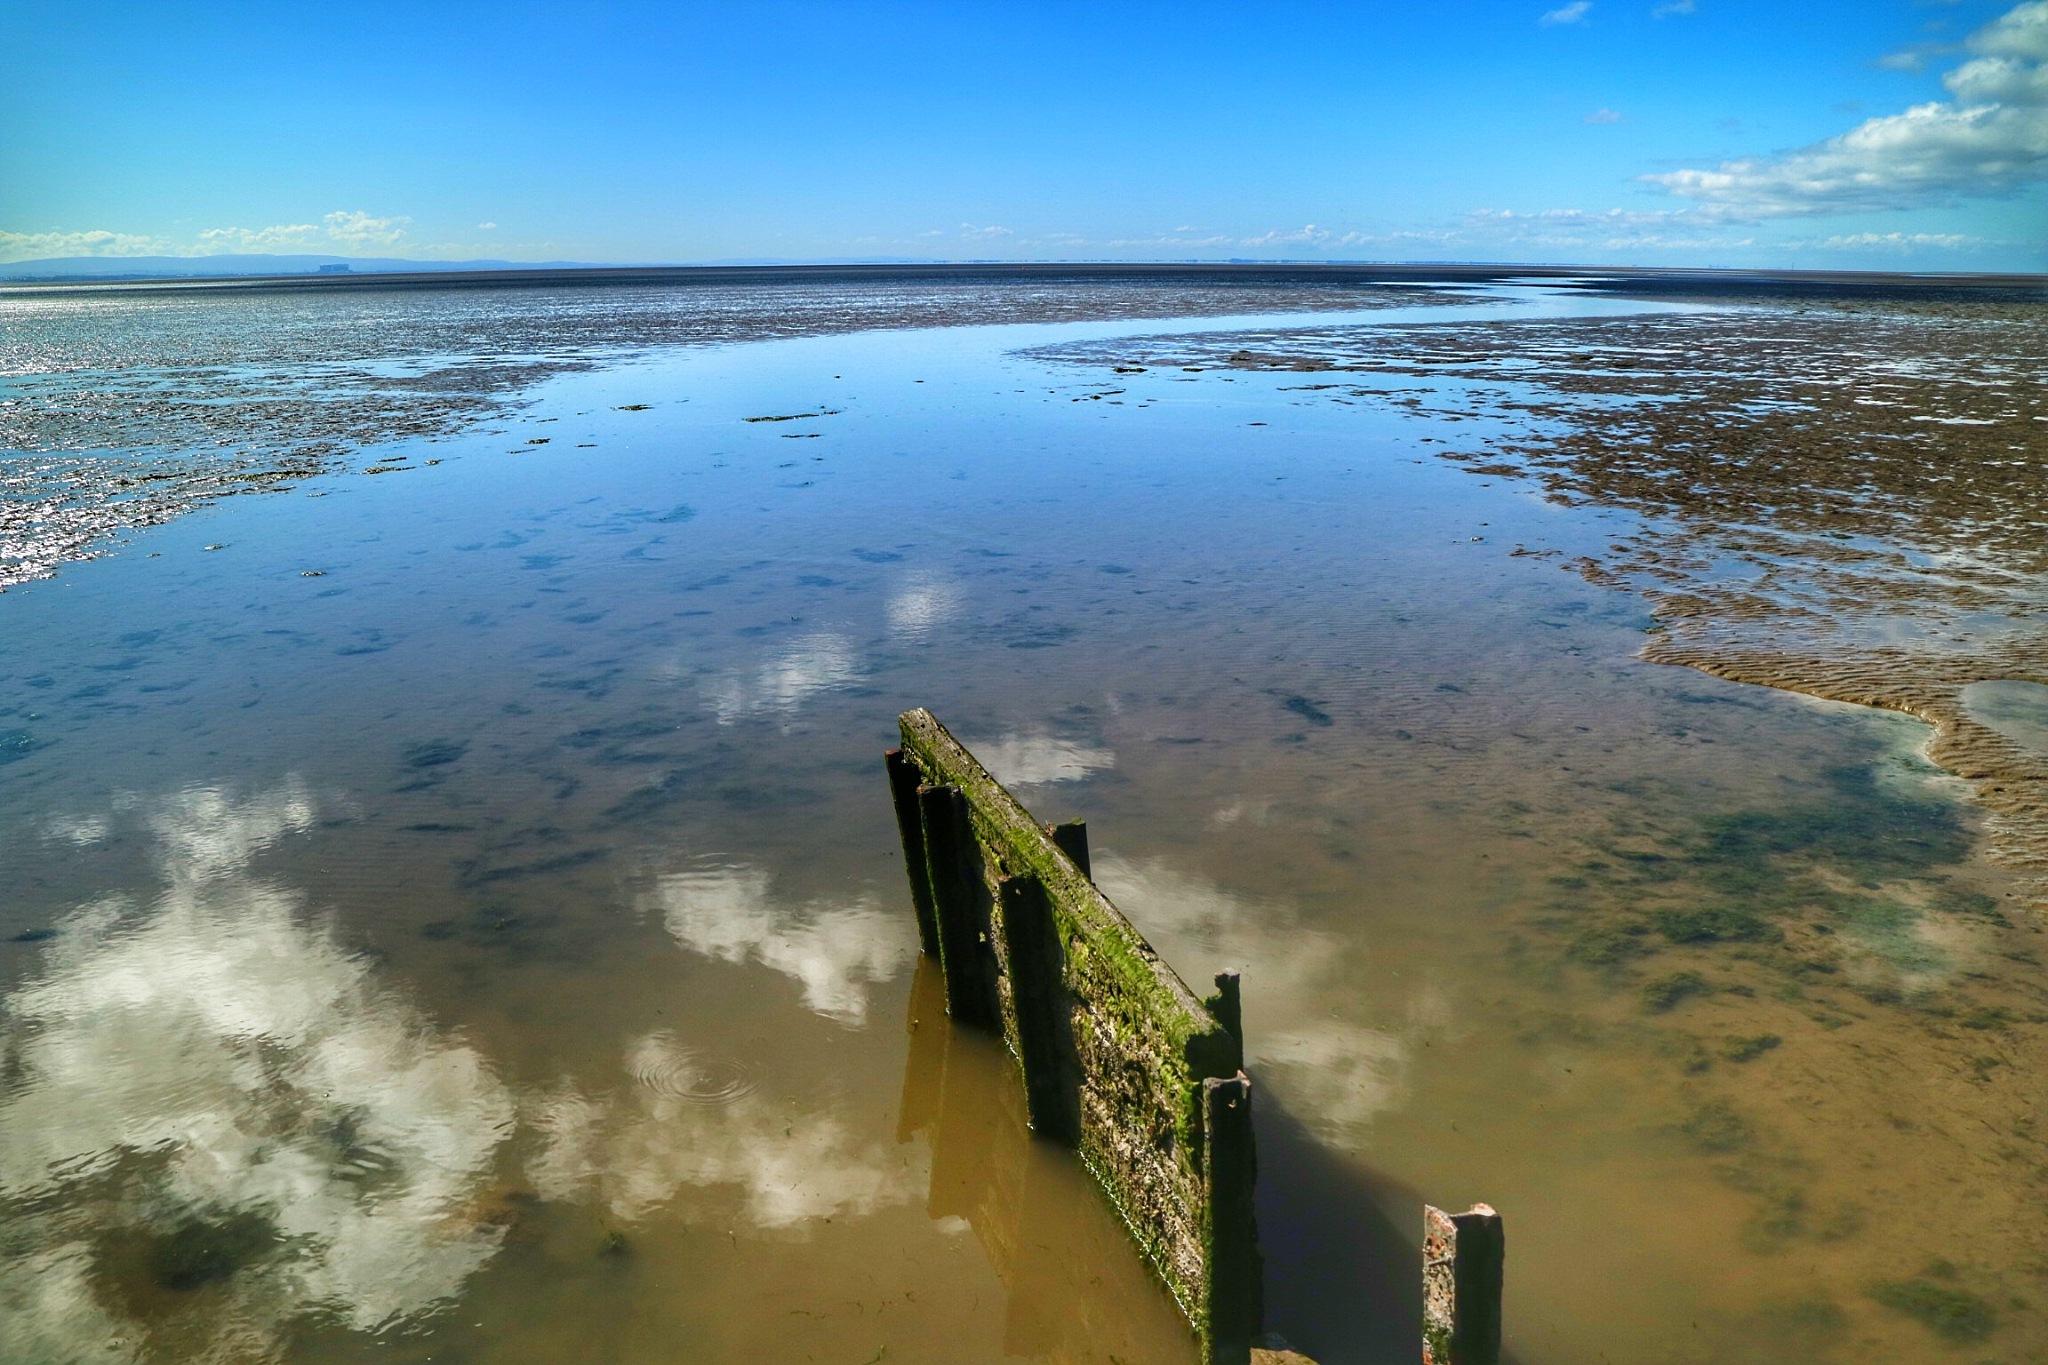 Morecambe Bay uk...080611 by Michael jjg